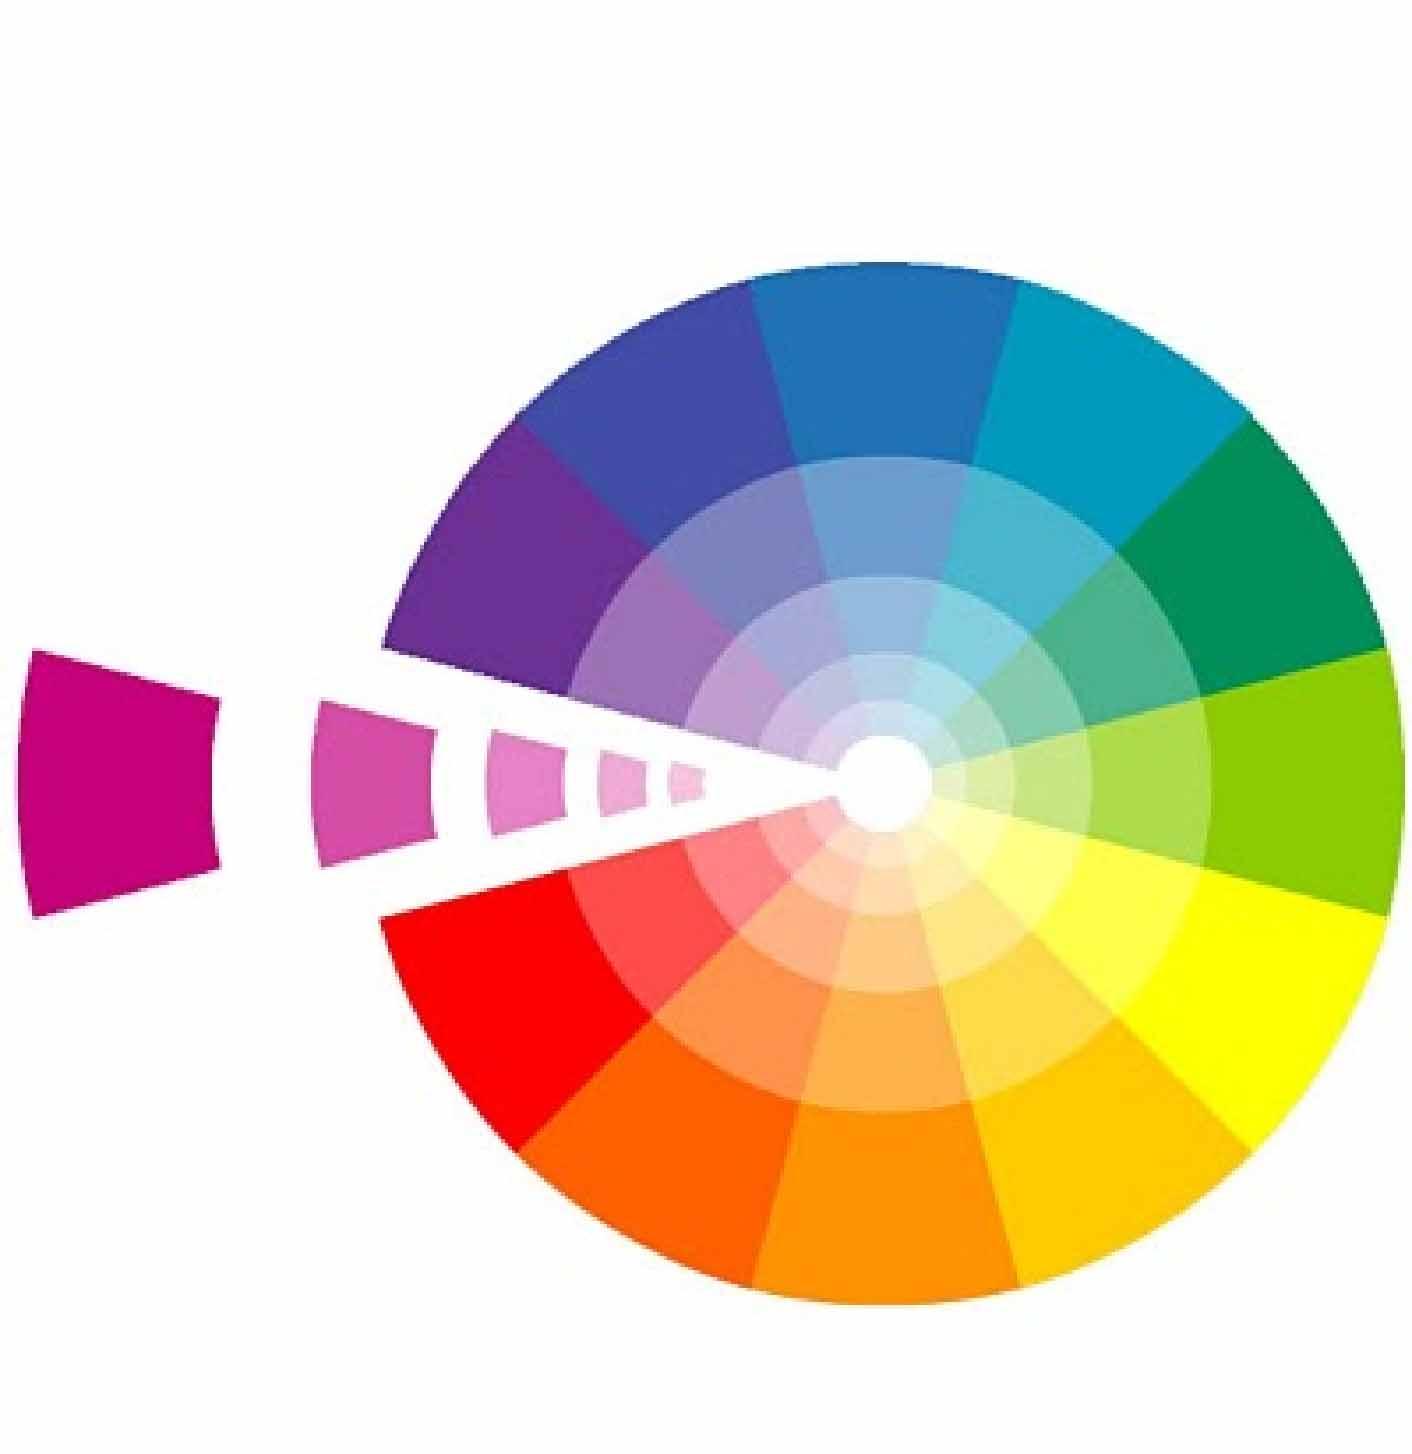 como usar corretivos coloridos alessandra faria